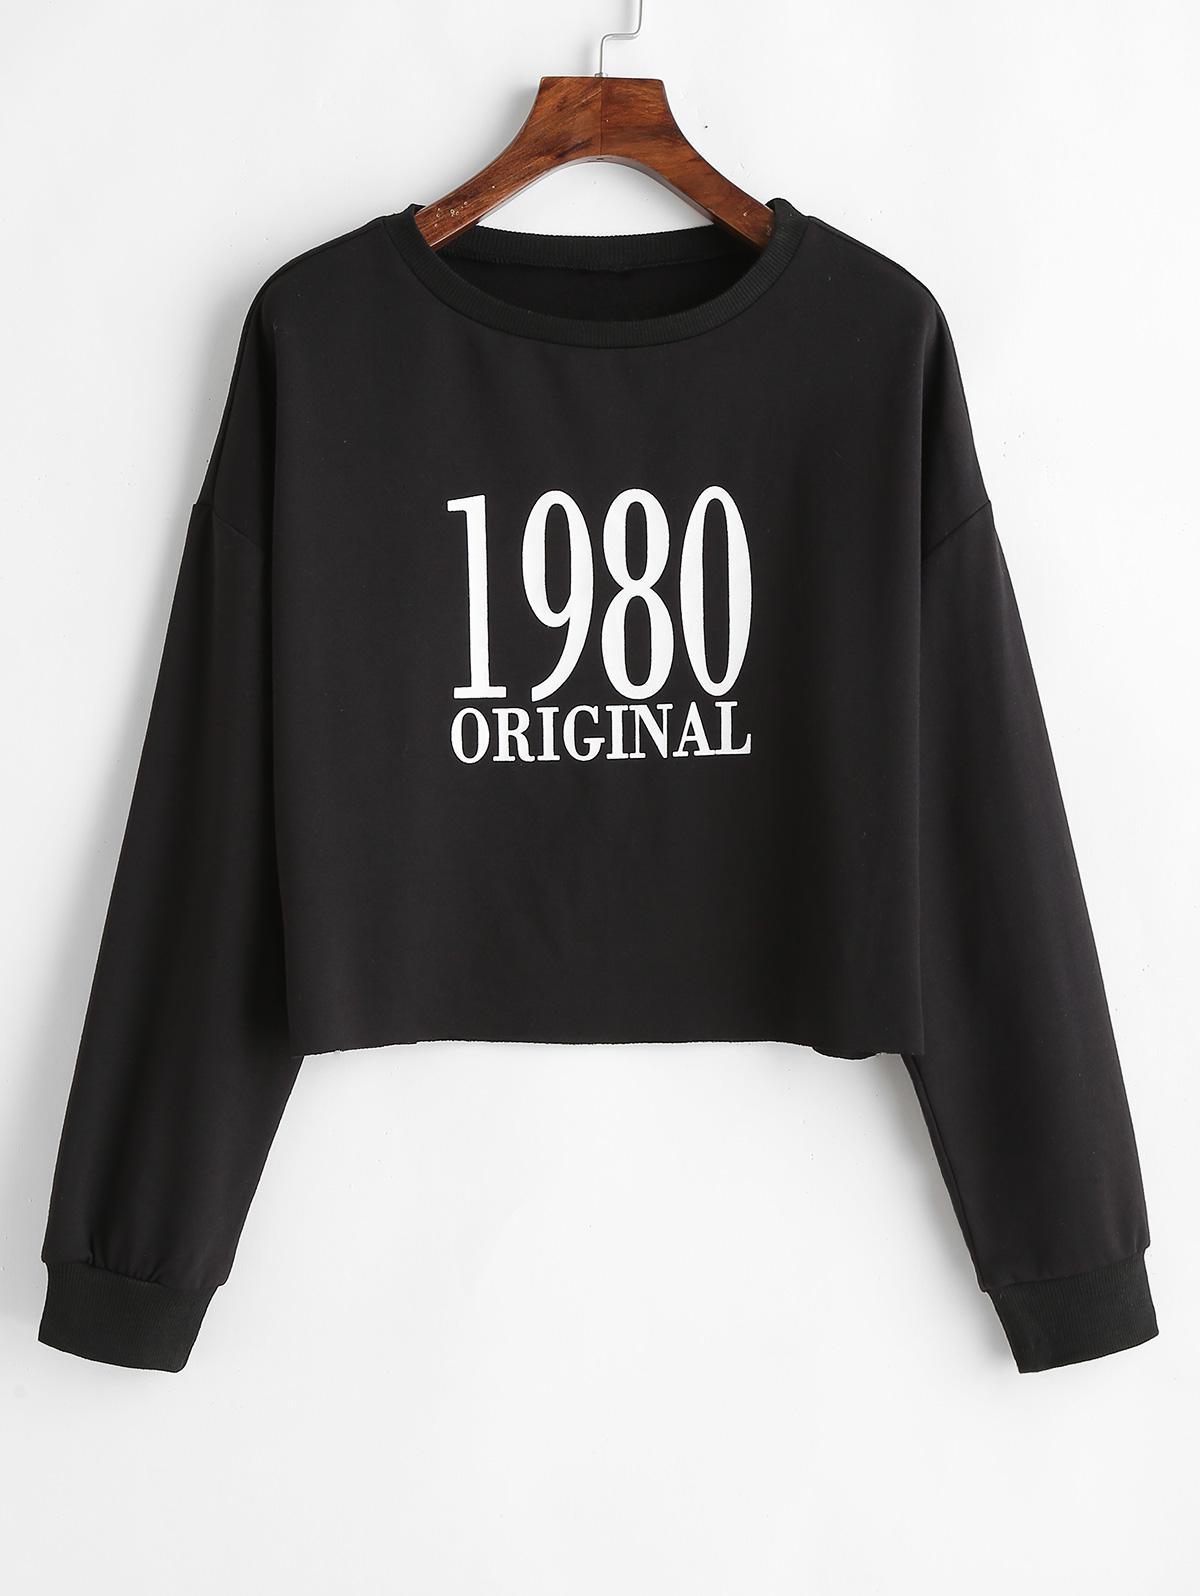 1980 Original Graphic Sweatshirt